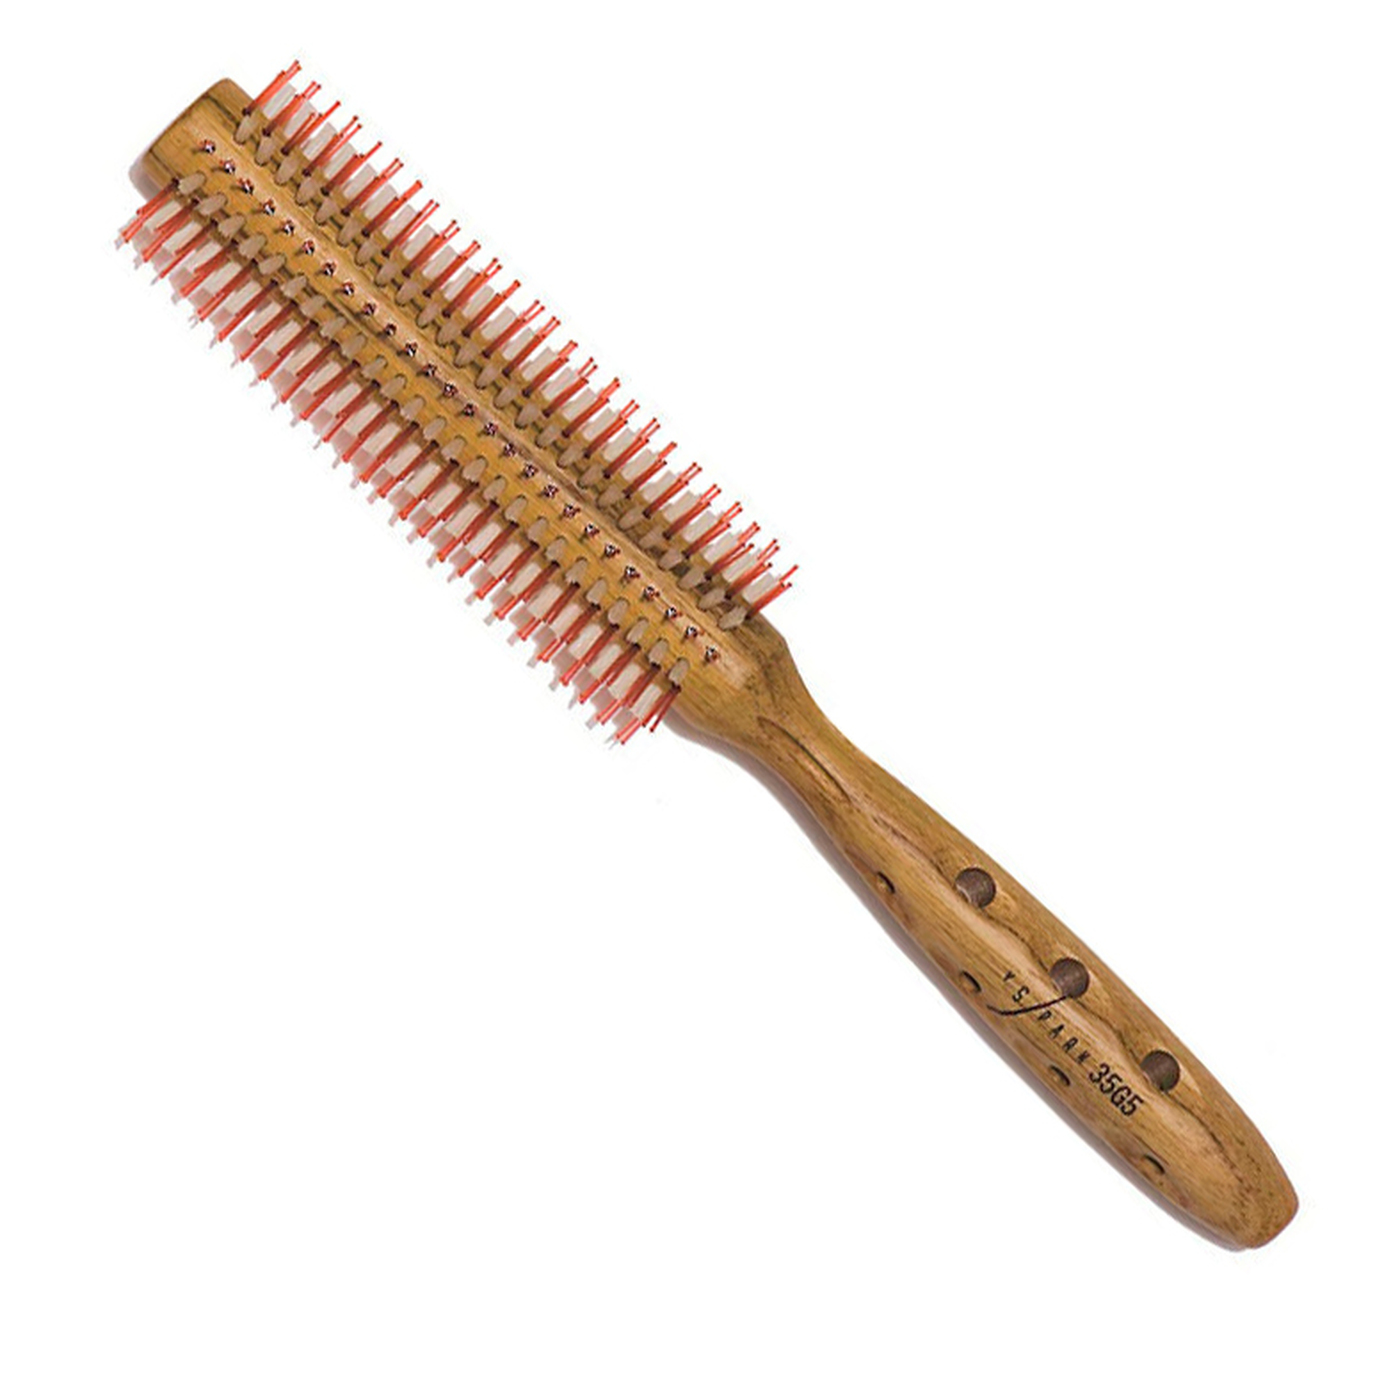 YS Park Mini Super G Series Hairbrush (YS-35G5)